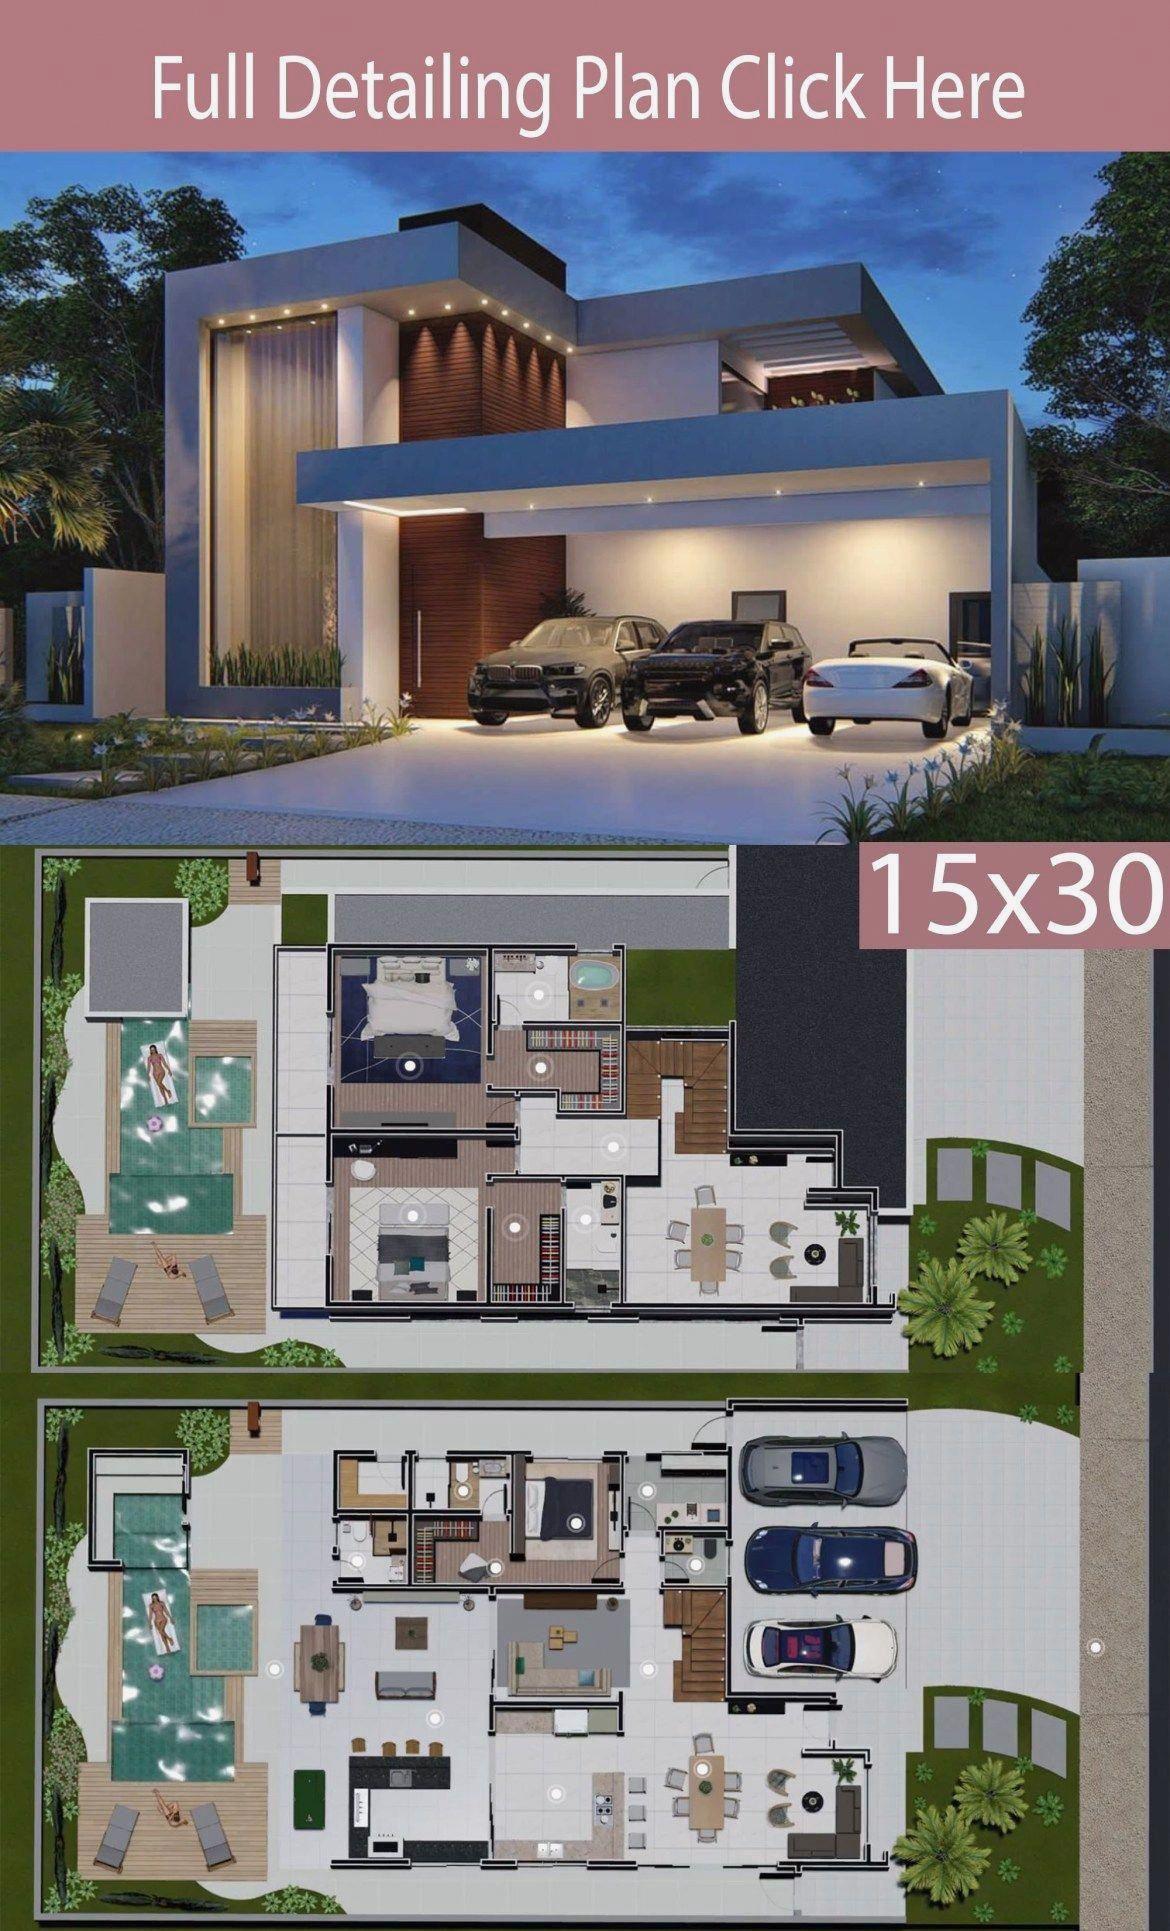 19 House Floor Plan Design App In 2020 Home Design Floor Plans Modern House Floor Plans Architectural House Plans